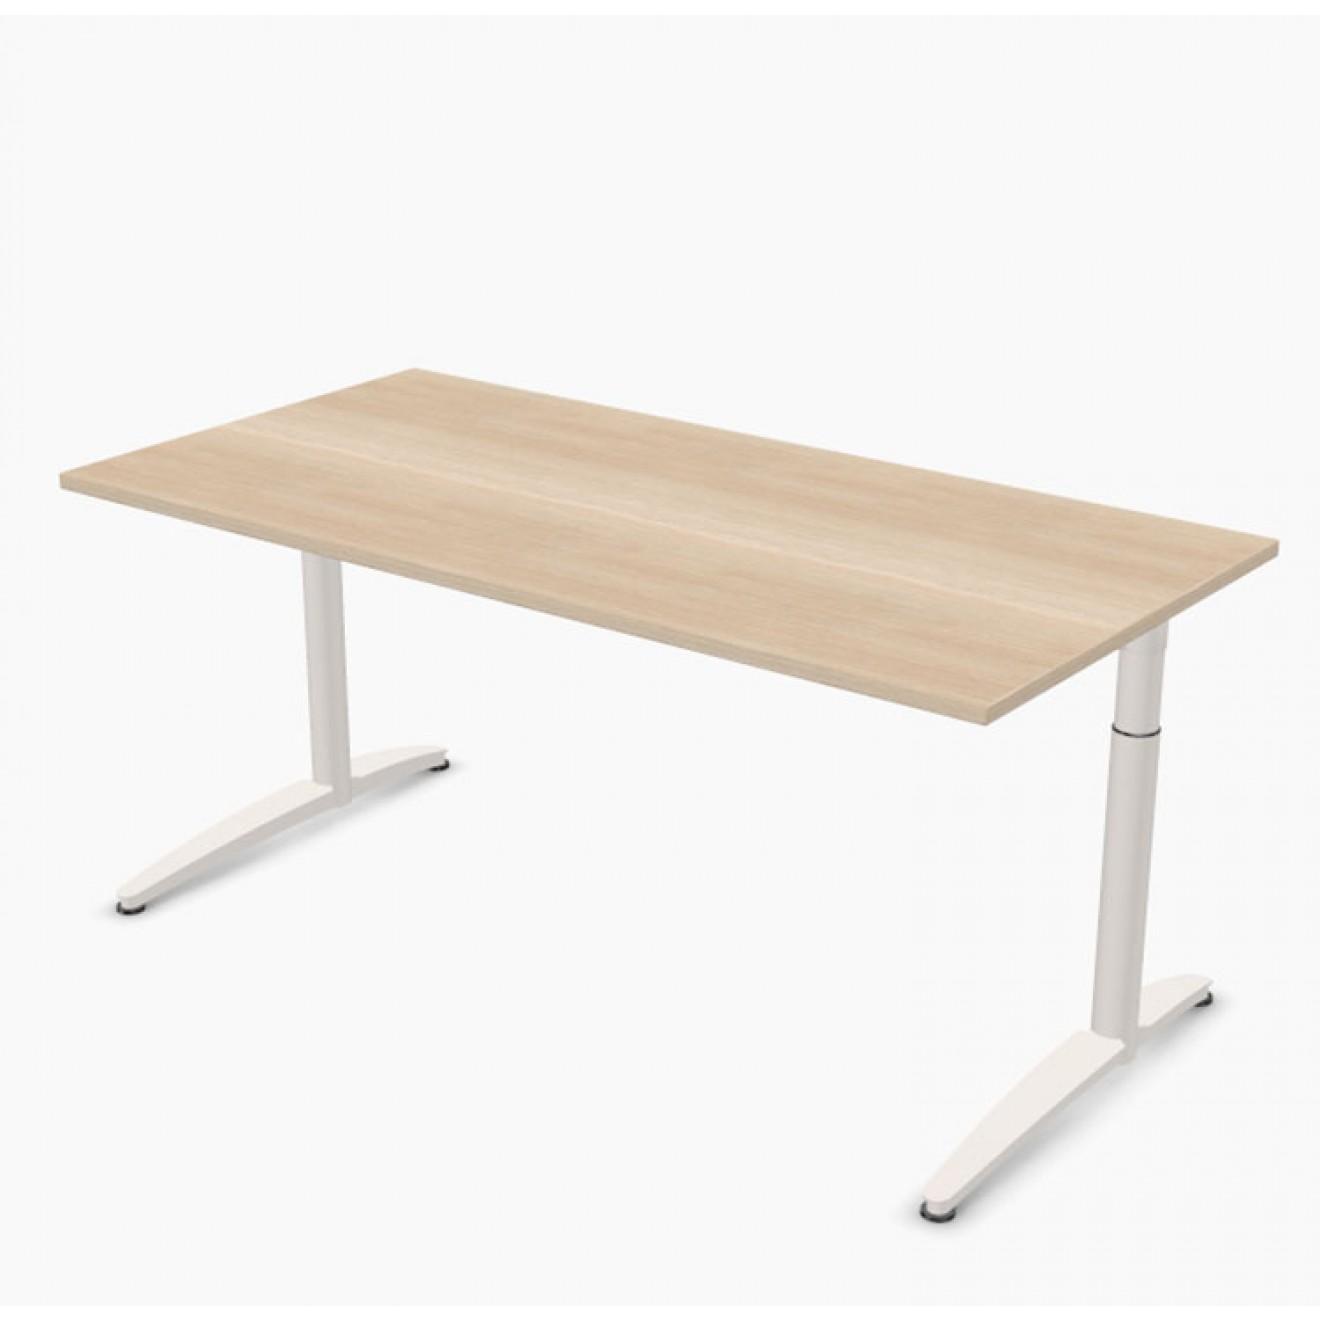 schreibtisch palmberg caldo 160 x 80 x 65 85 cm. Black Bedroom Furniture Sets. Home Design Ideas